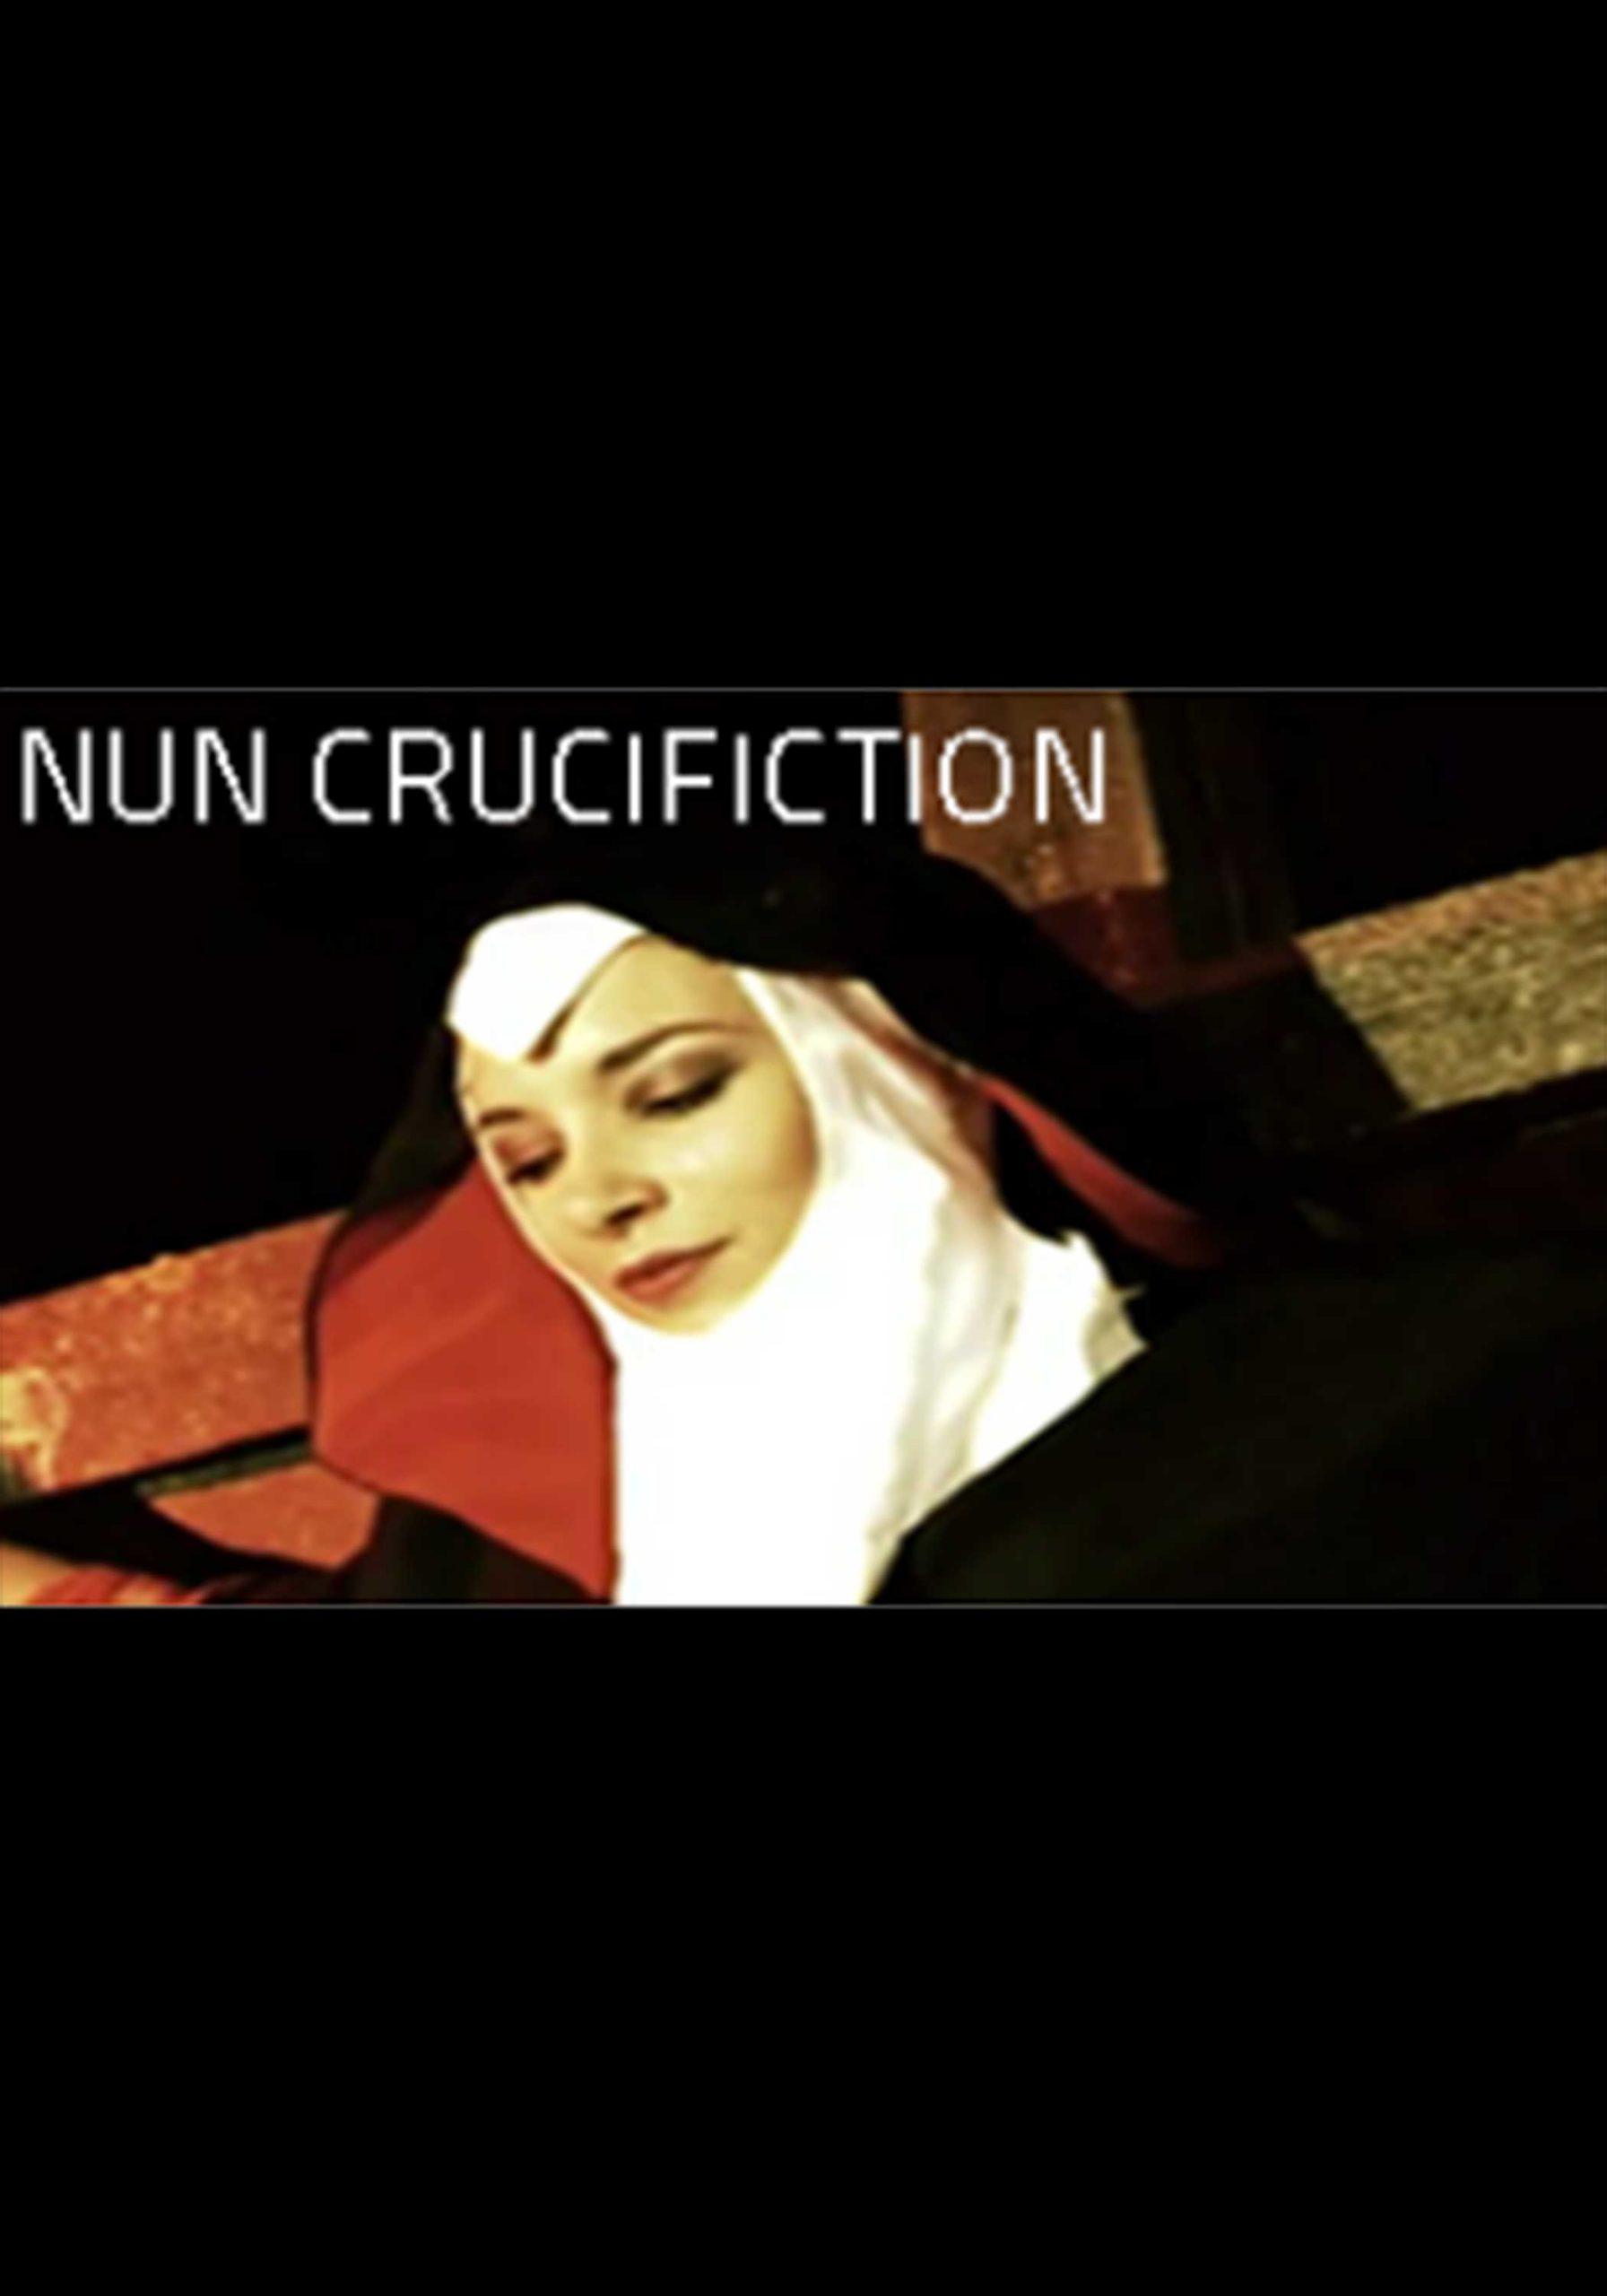 Nun Crucifixion (short)